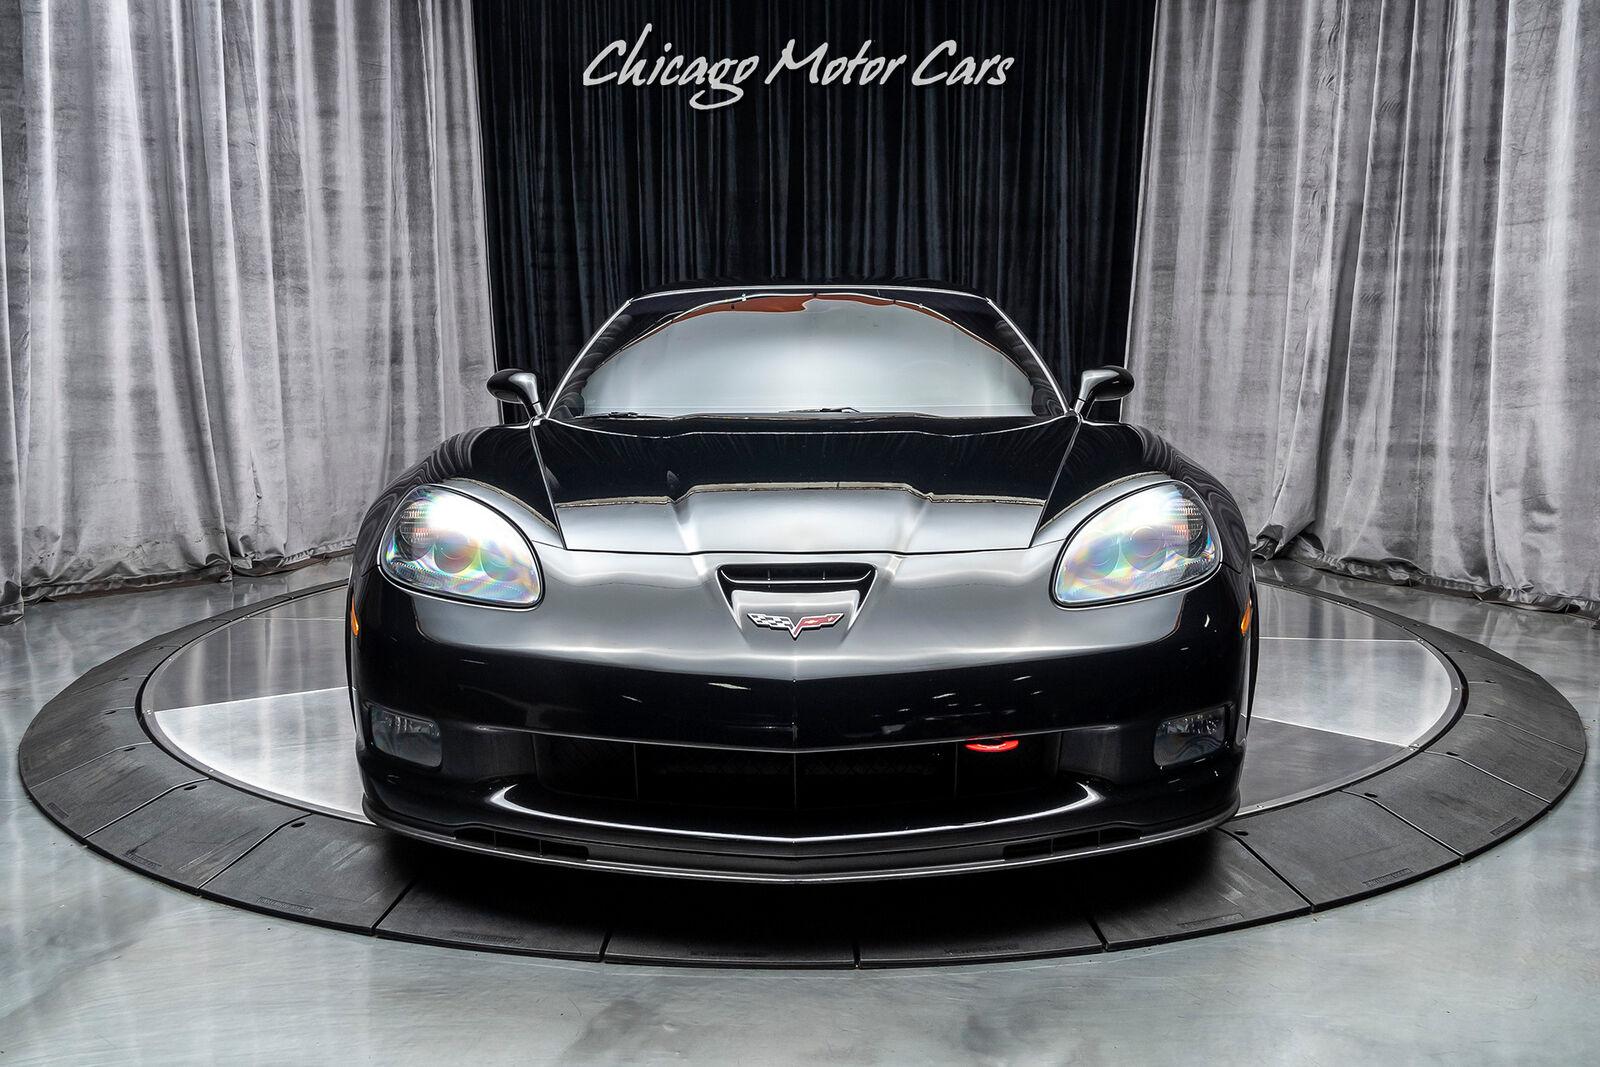 2008 Black Chevrolet Corvette Z06 3LZ | C6 Corvette Photo 7